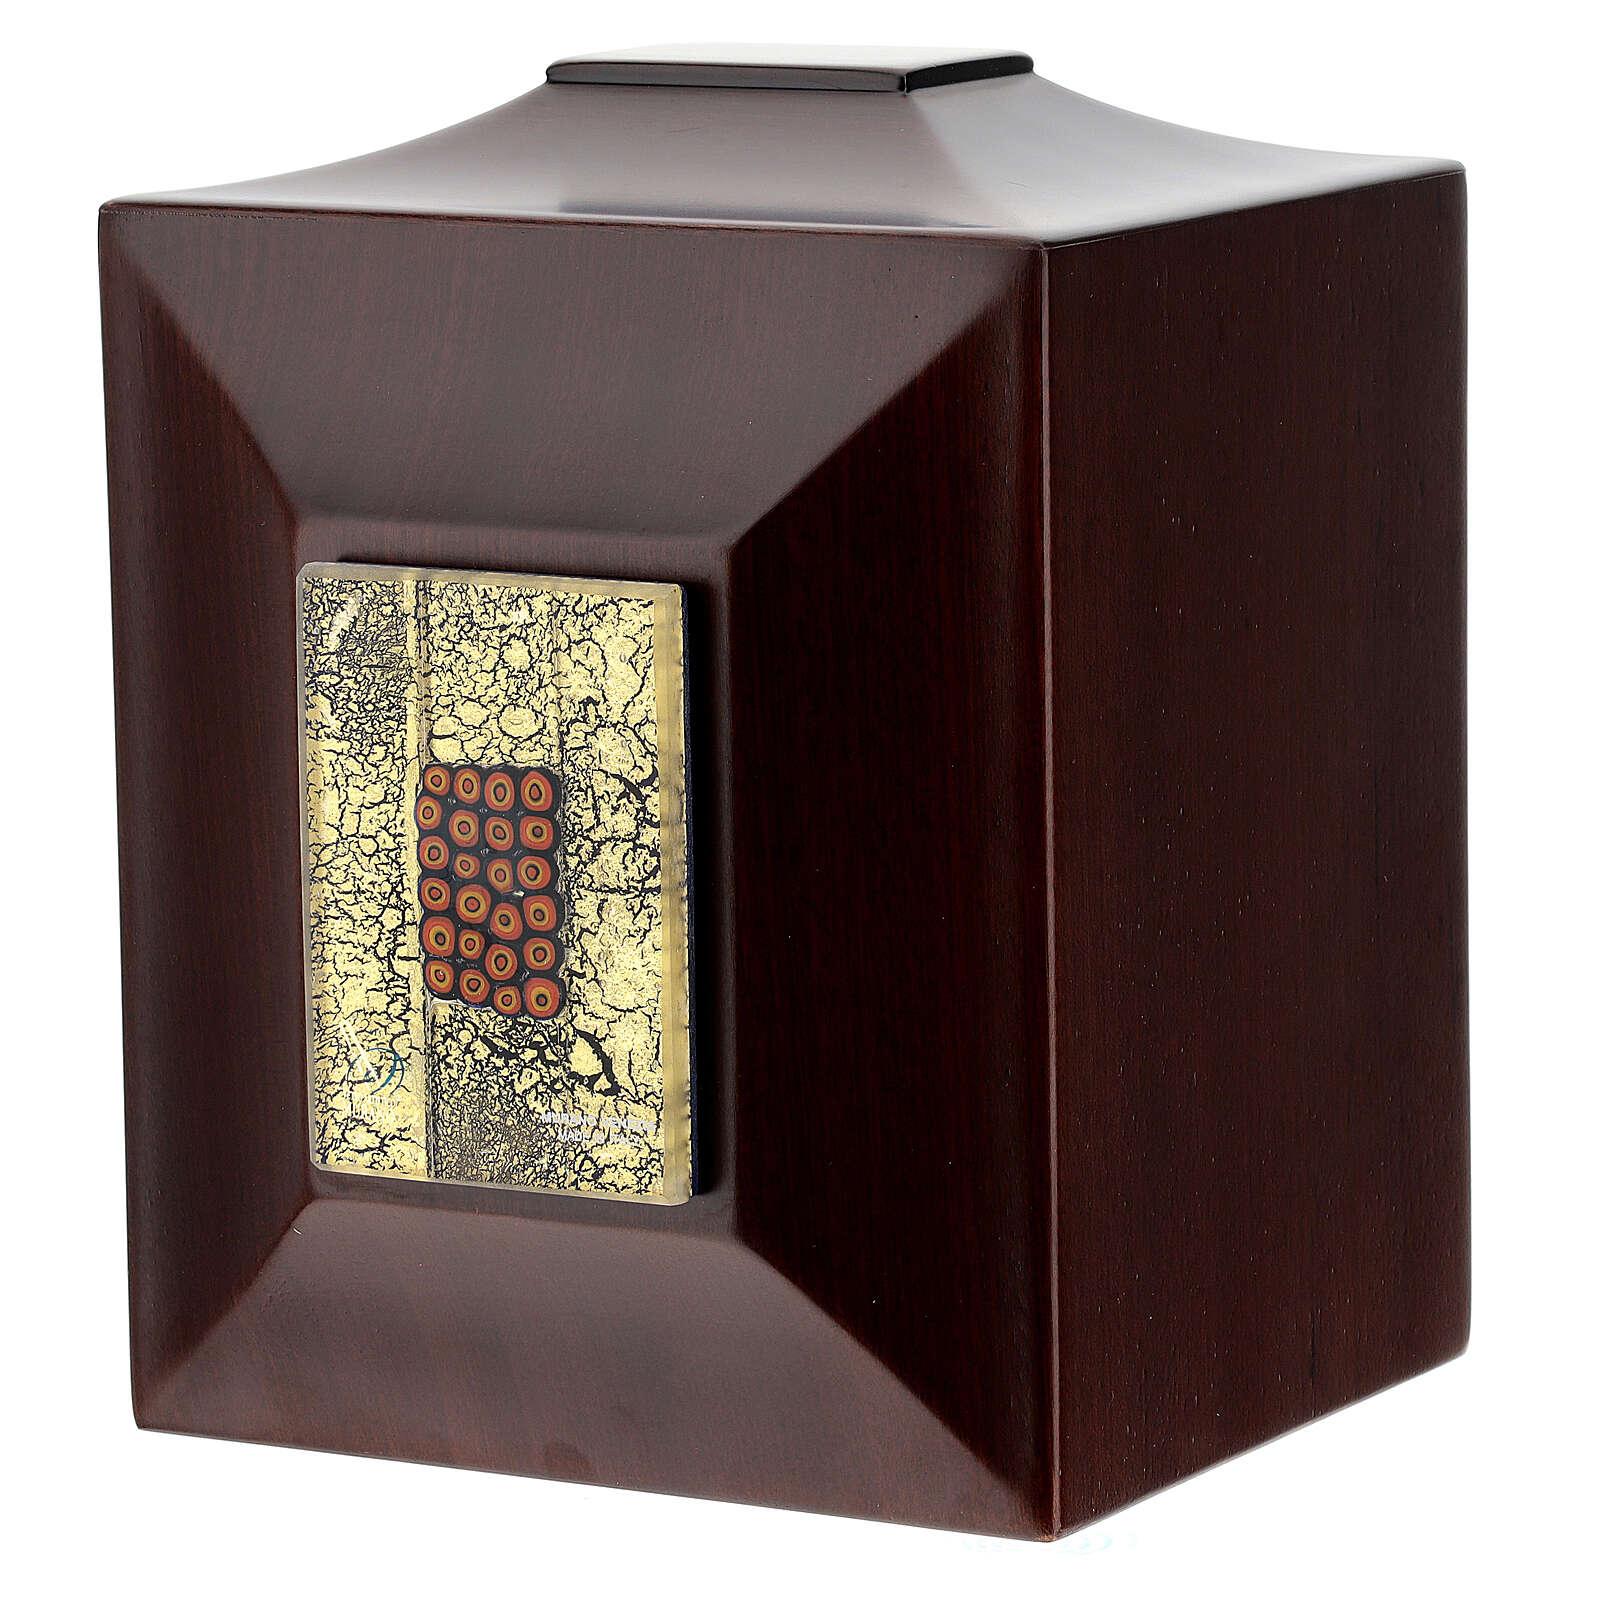 Urna cineraria Venecia caoba con vidrio de Murano y hoja oro 3